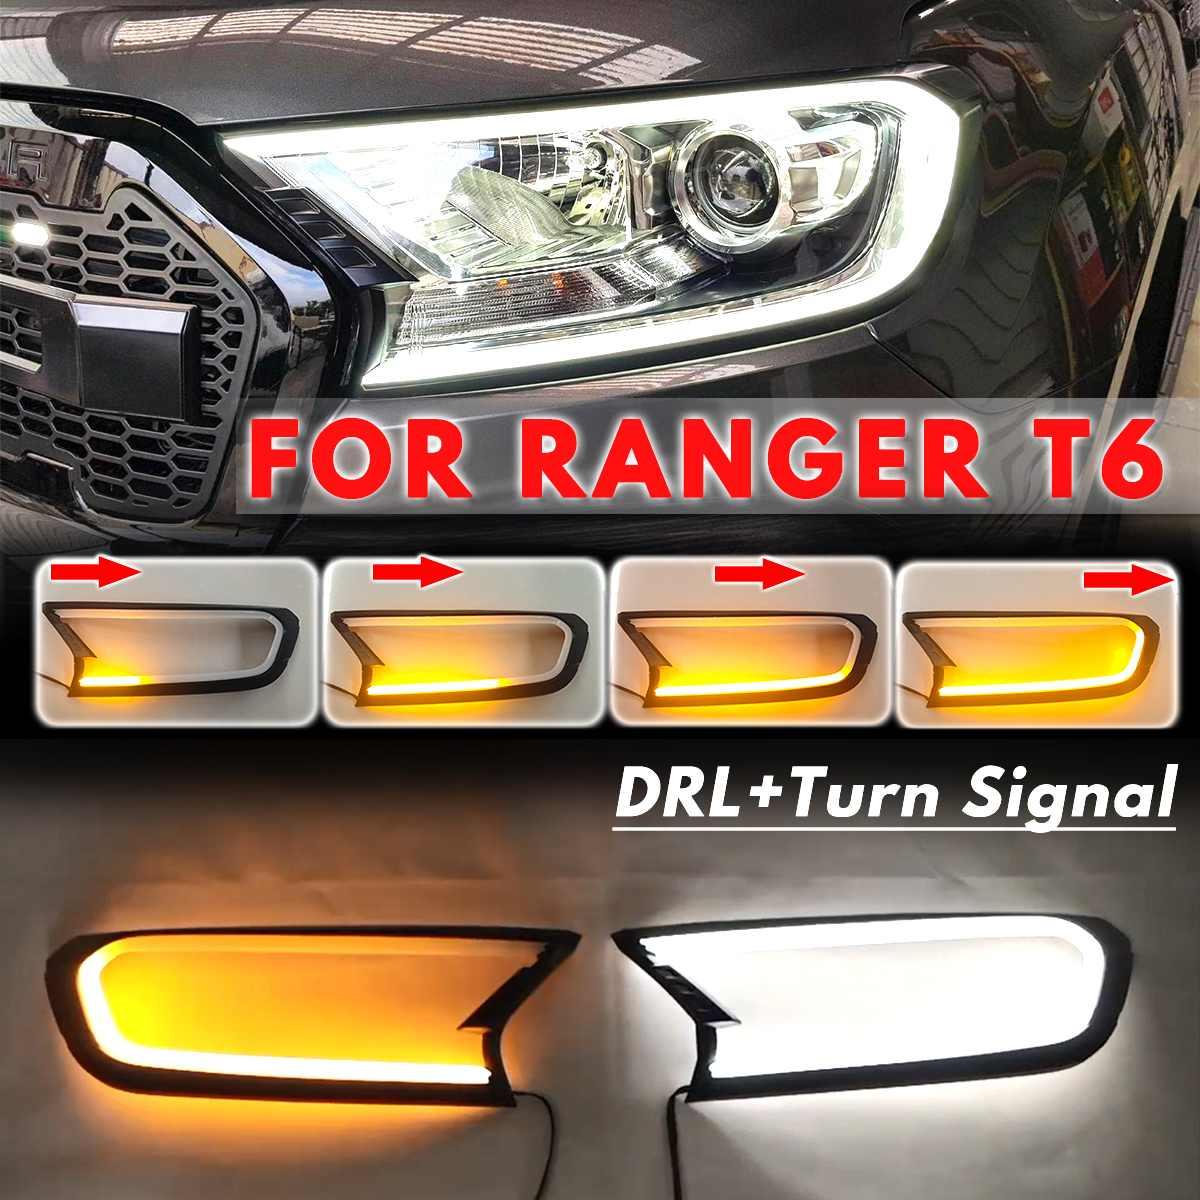 3 Estilo 2x LED cabeza de luz cubierta de cubierta frontal Trim para FORD RANGER T6 WILDTRAK 2015 2016 2017 2018 ABS campanas de lámpara